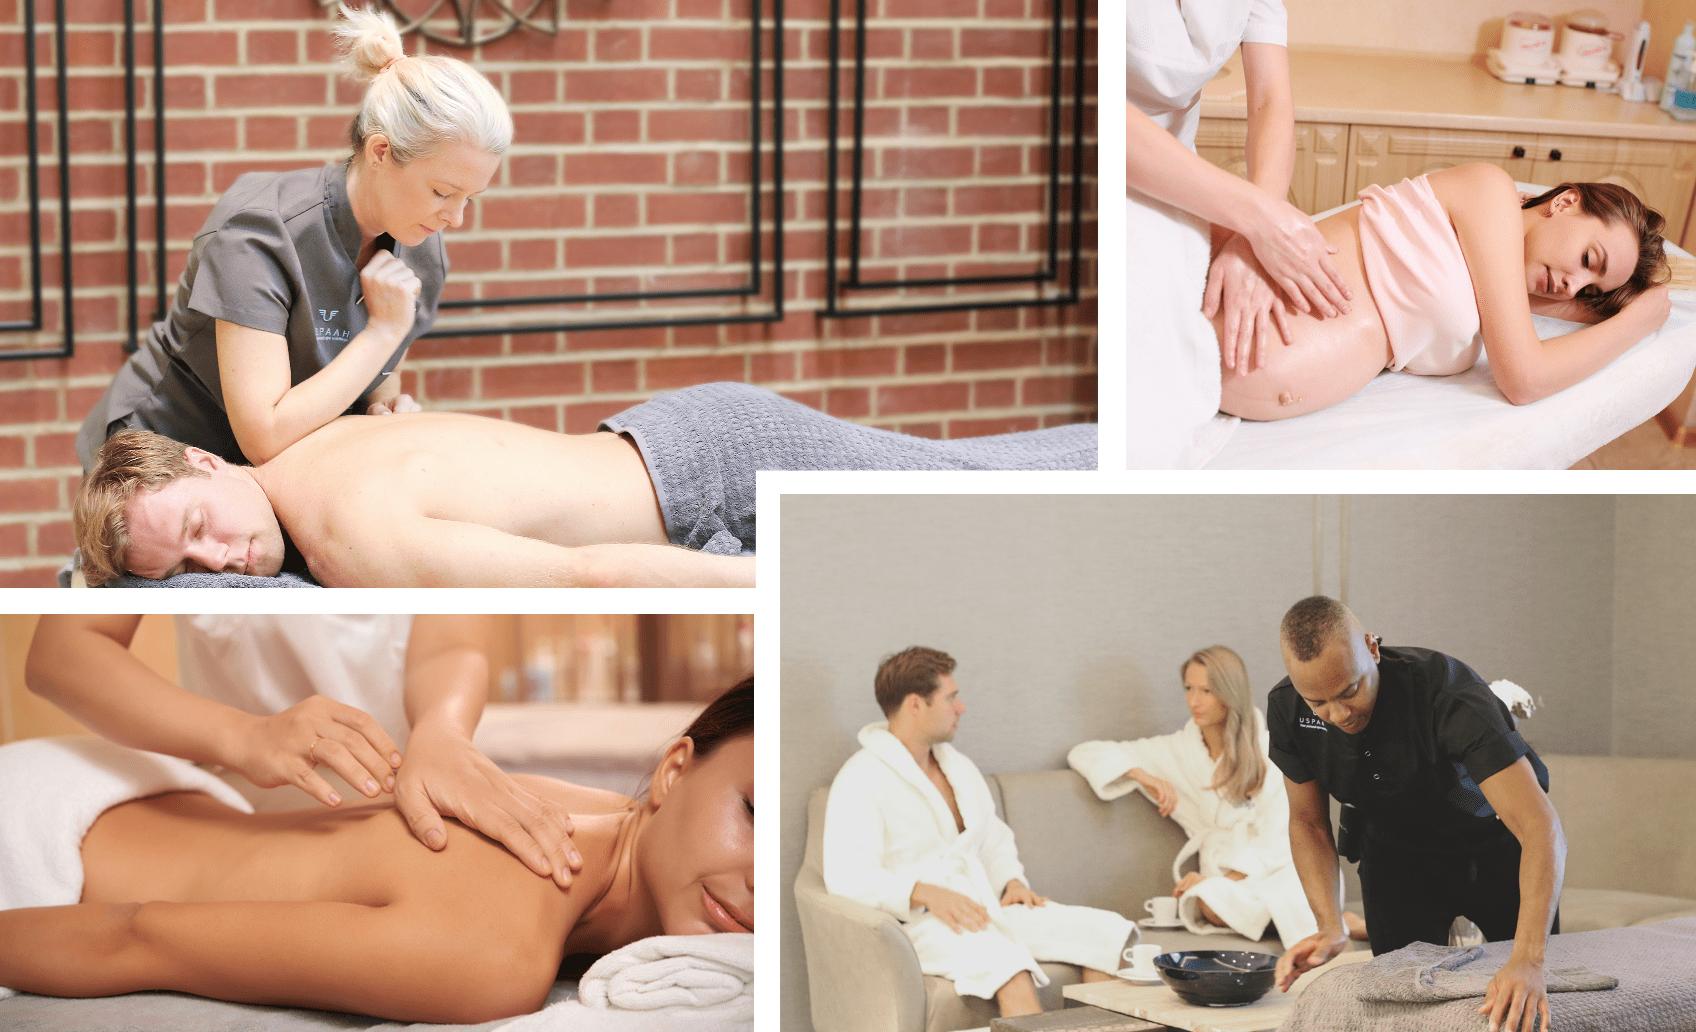 massage services collage